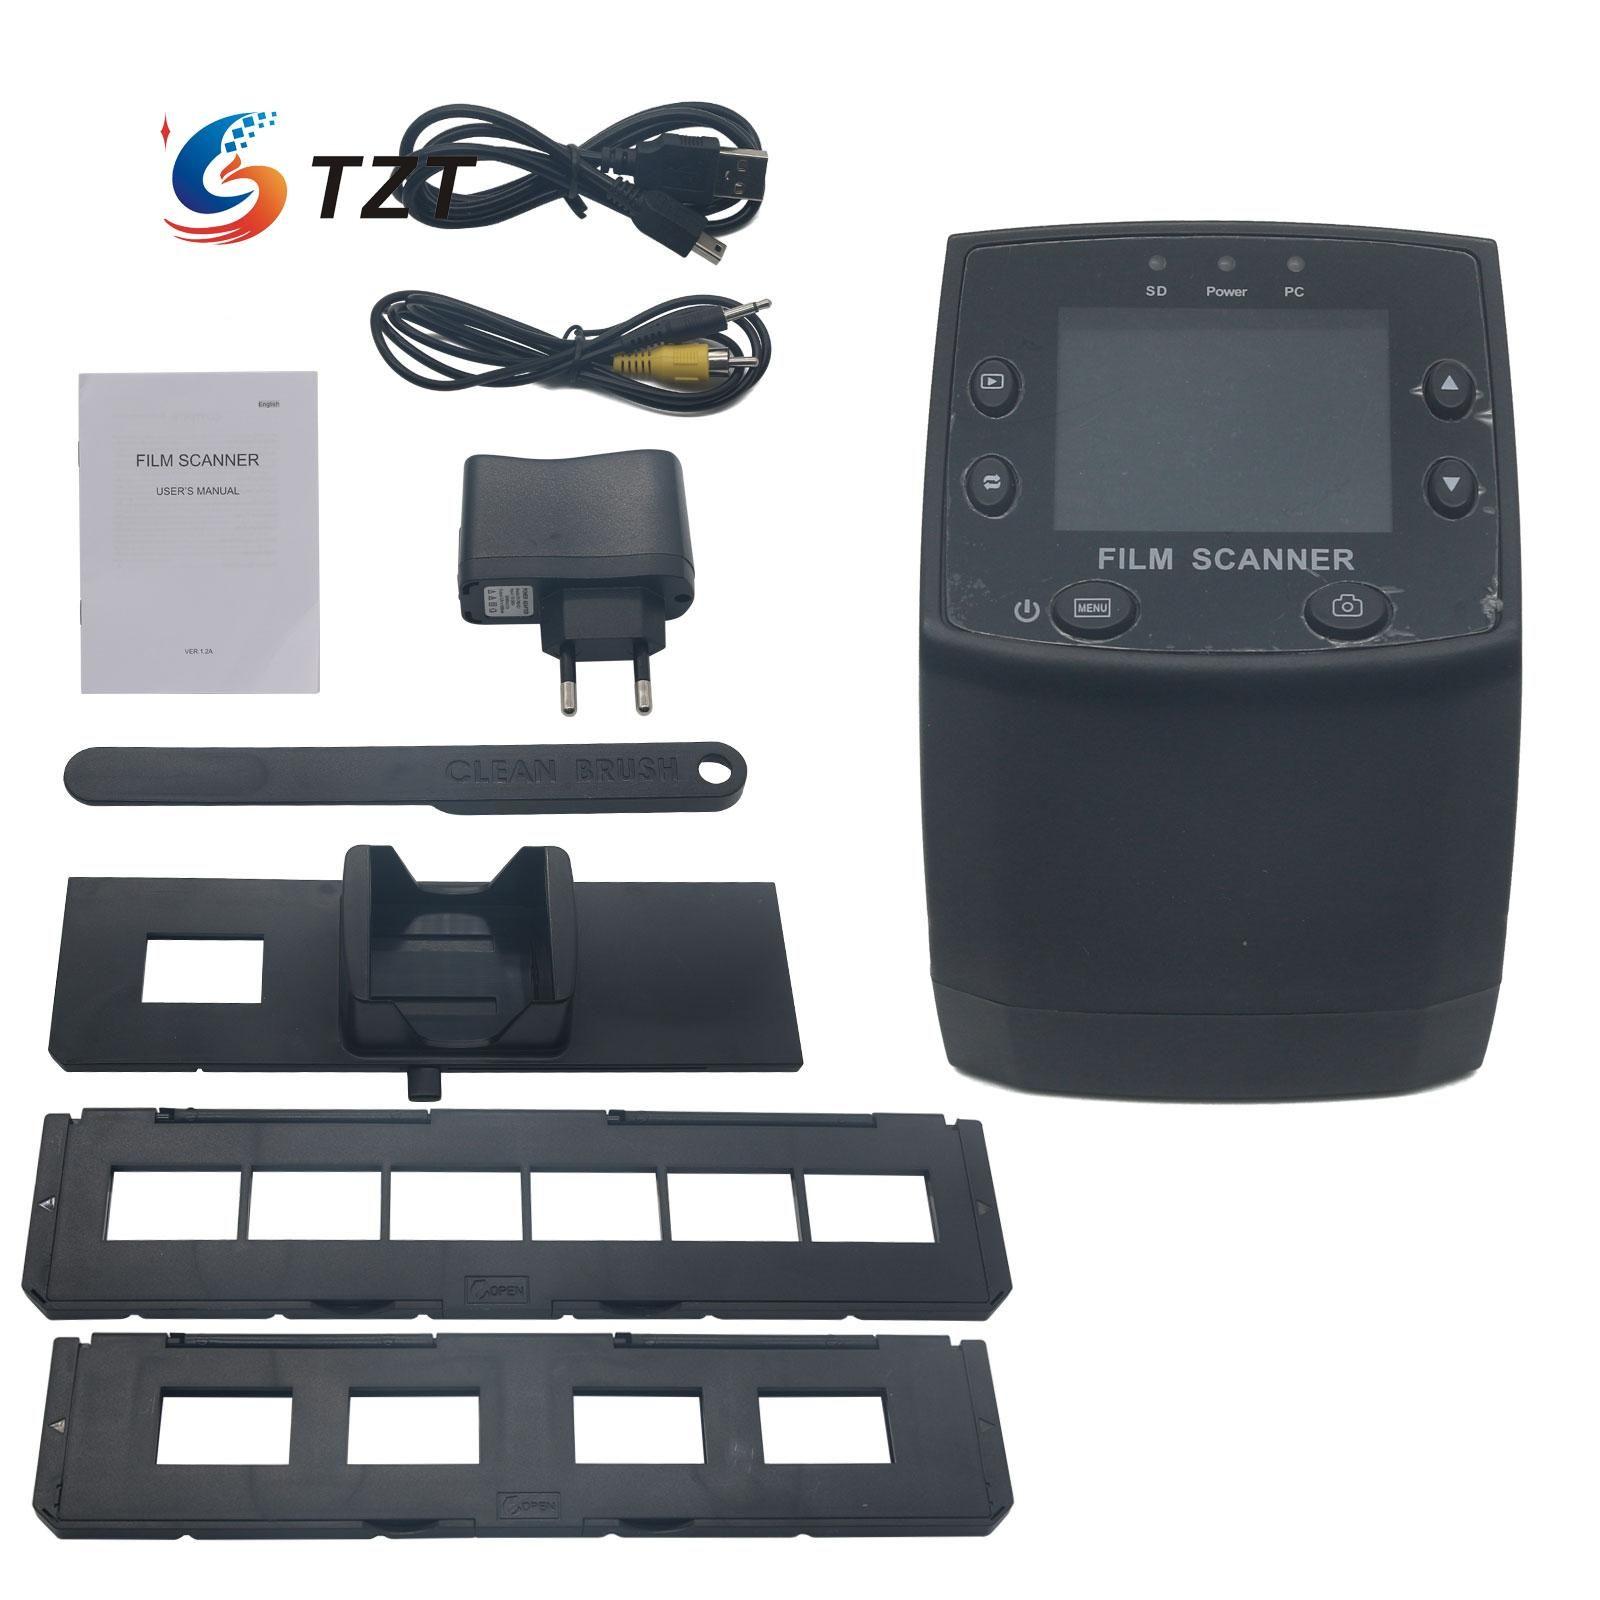 EC717 5MP Negative Film Slide Viewer Scanner USB Digital Color Monochrome Photo Copier